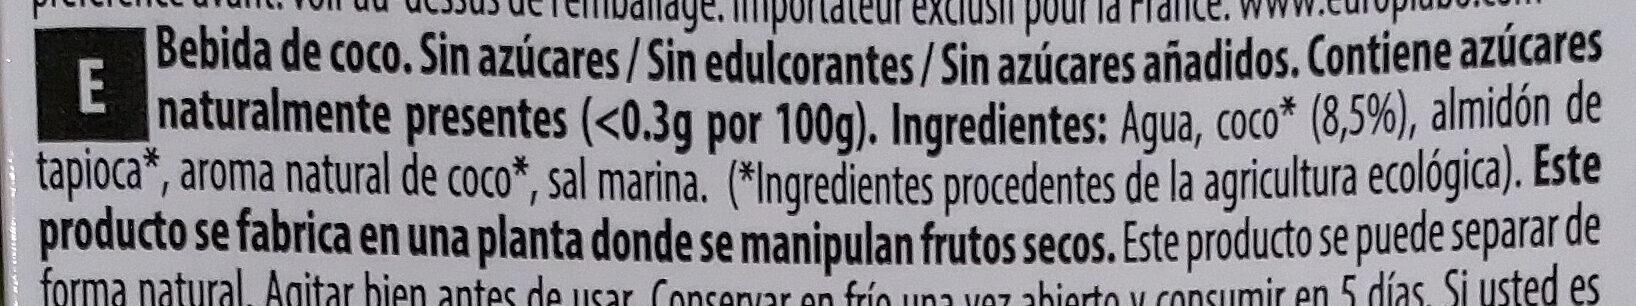 Coconut milk - Ingredientes - es